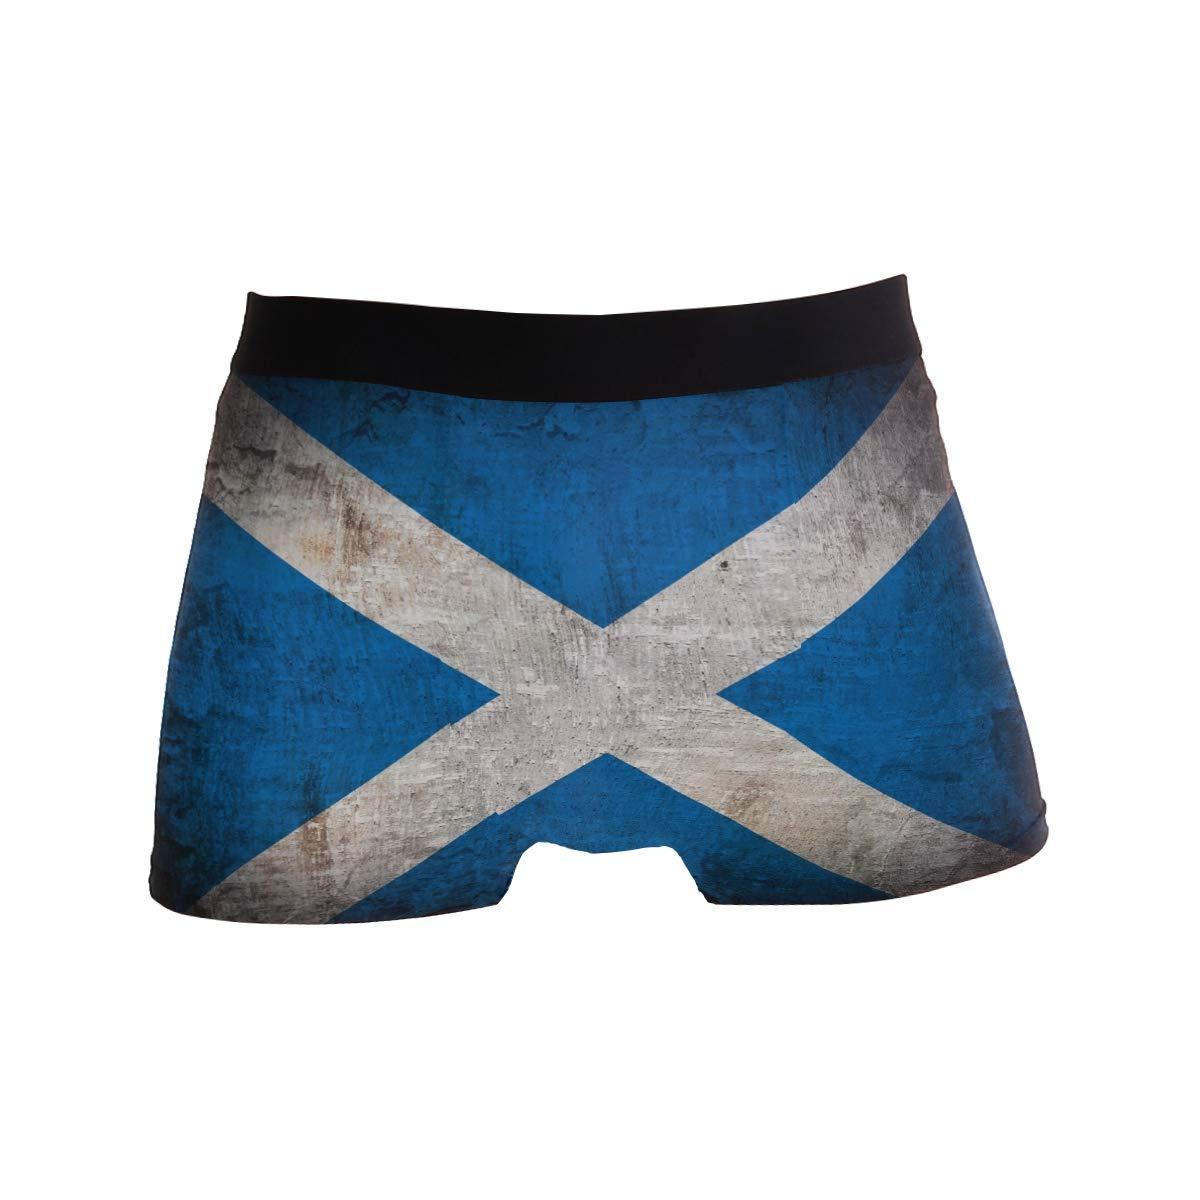 ZZKKO Retro Grunge Scotland Flag Mens Boxer Briefs Underwear Breathable Stretch Boxer Trunk with Pouch S-XL